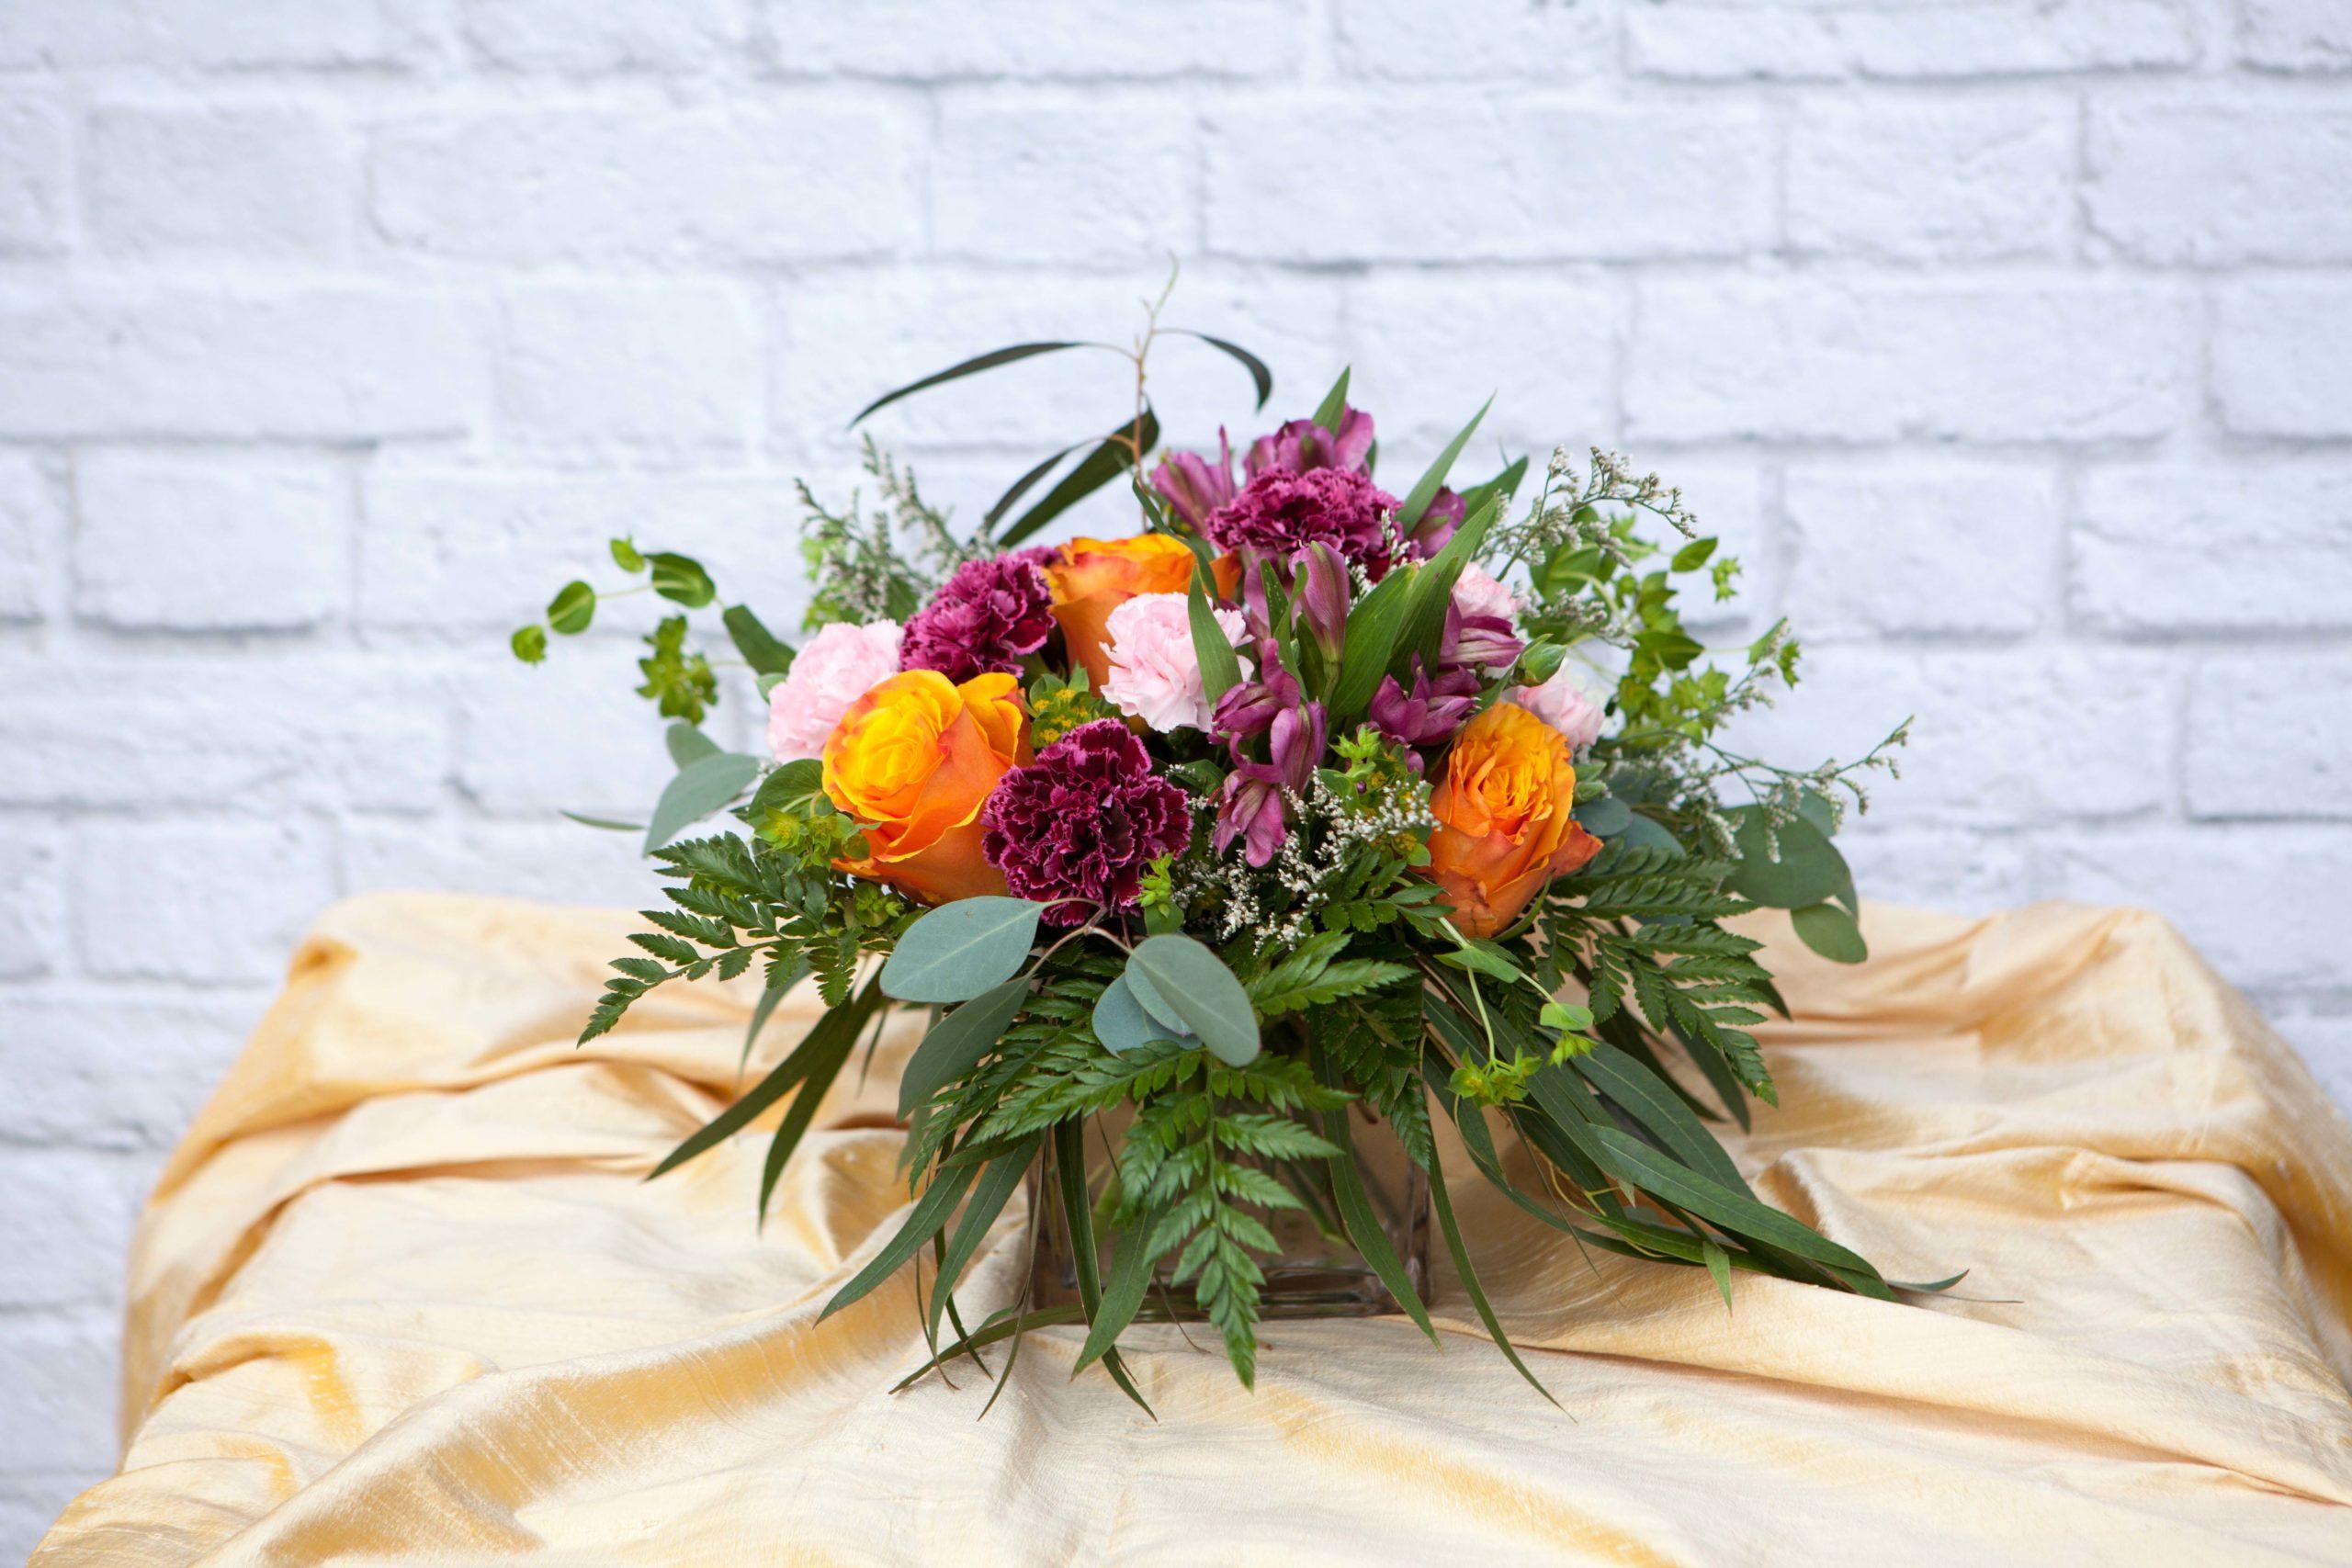 Floral design by Anchorage florist Natasha Price of Paper Peony Alaska